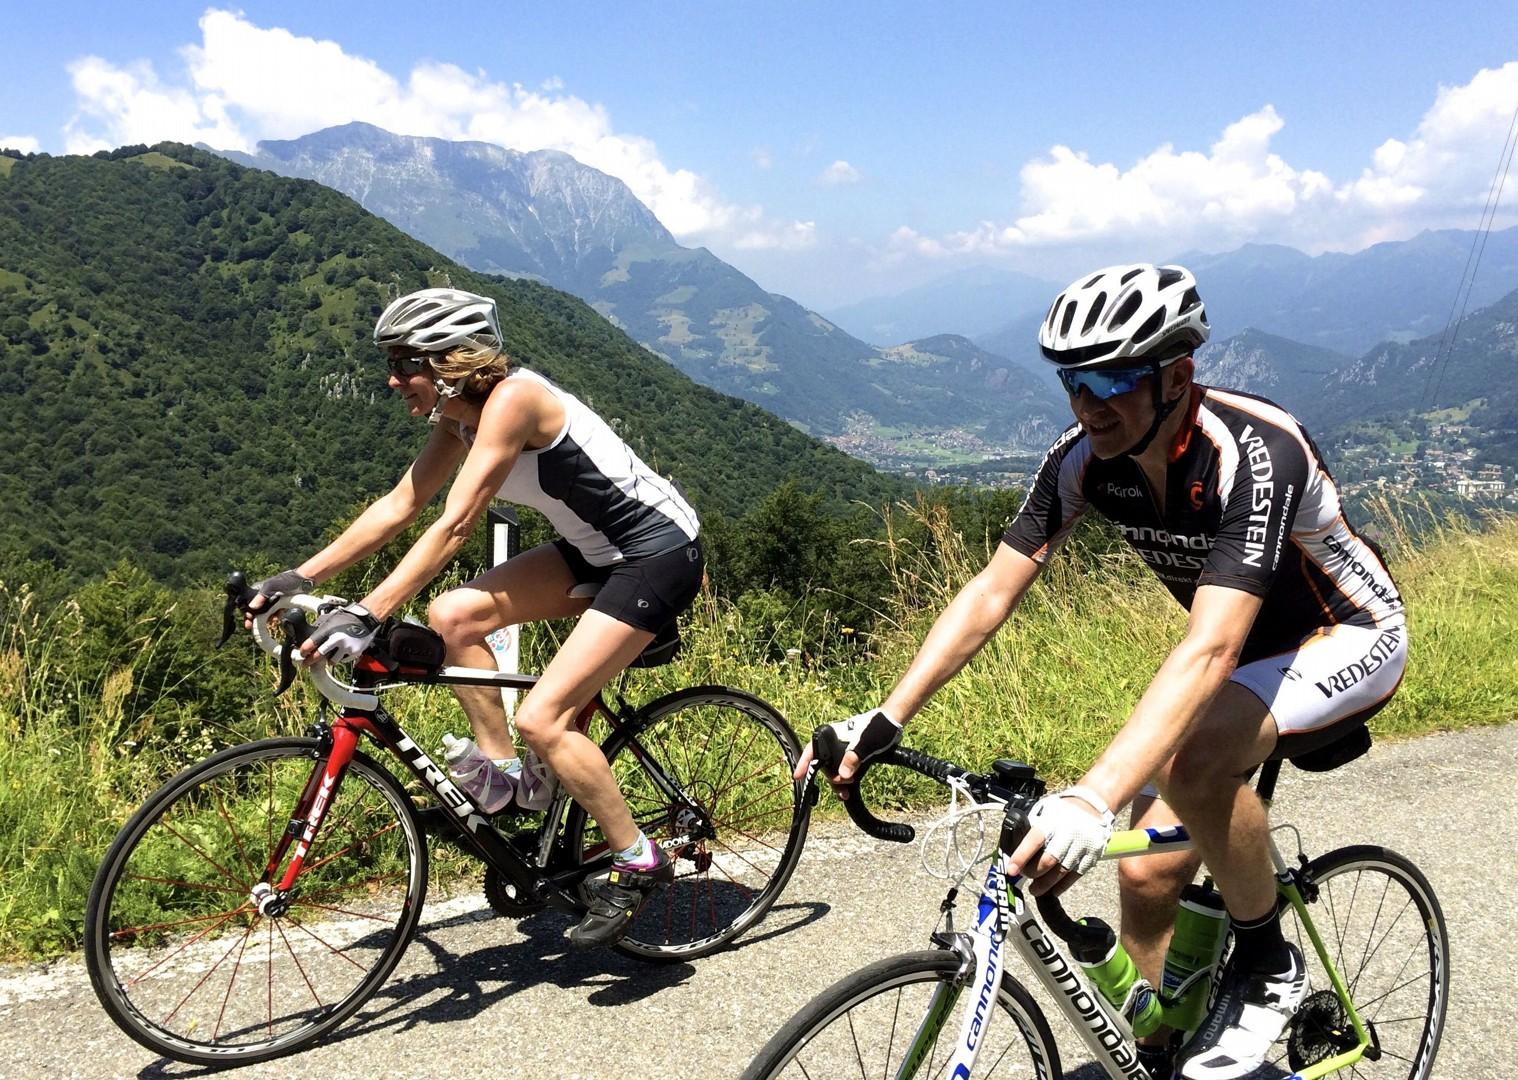 lombardia11.jpg - Italy - Lakes of Lombardia - Guided Road Cycling Holiday - Road Cycling